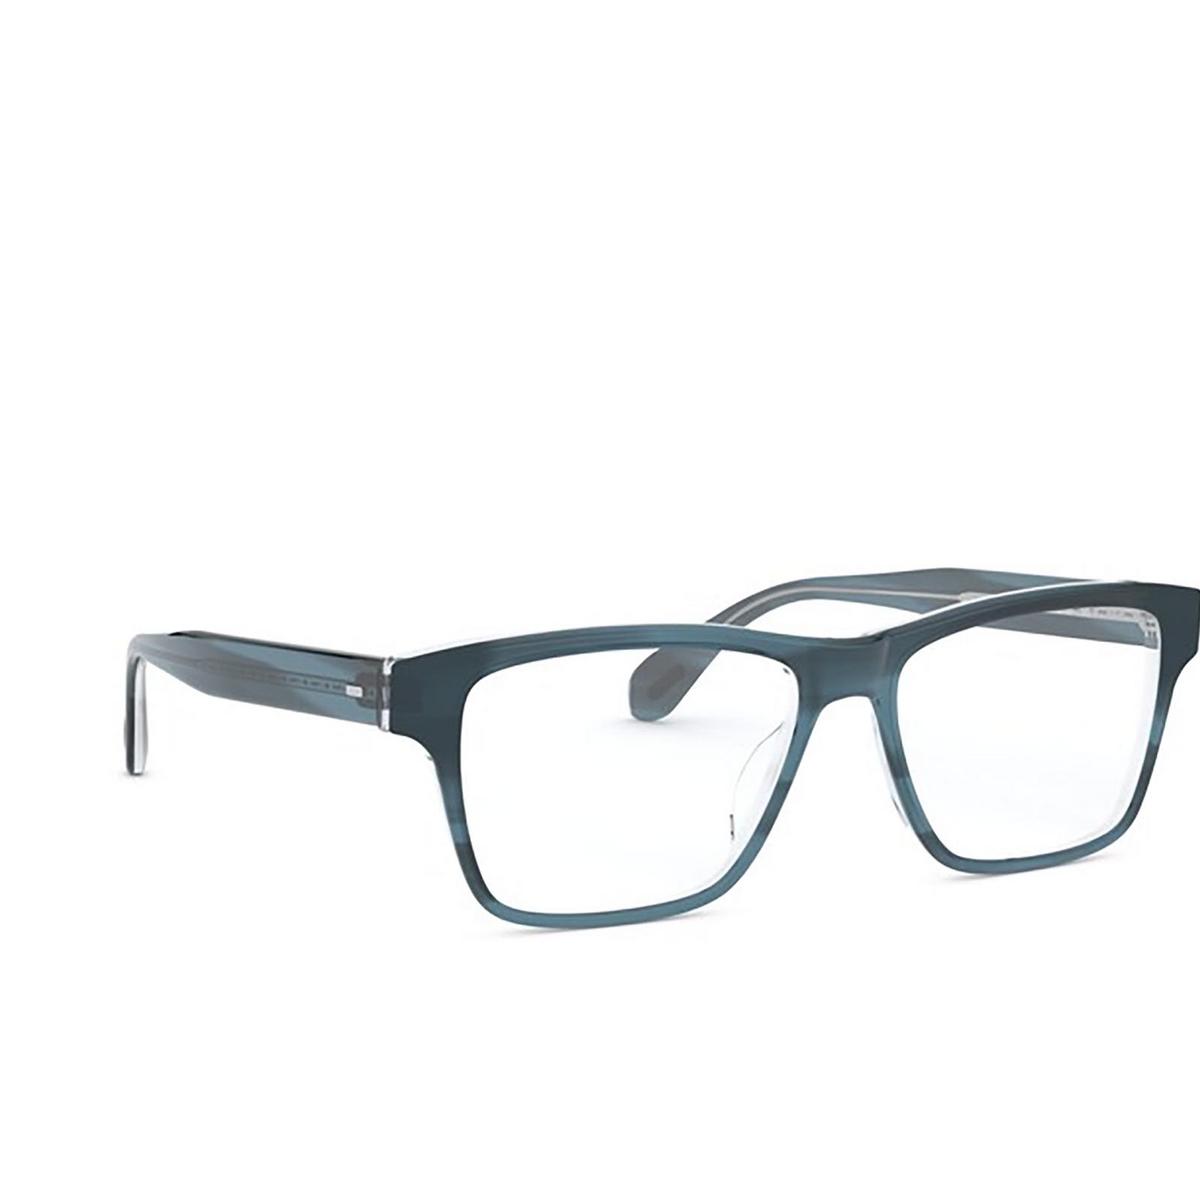 Oliver Peoples® Rectangle Eyeglasses: Osten OV5416U color Indigo Havana 1662 - three-quarters view.